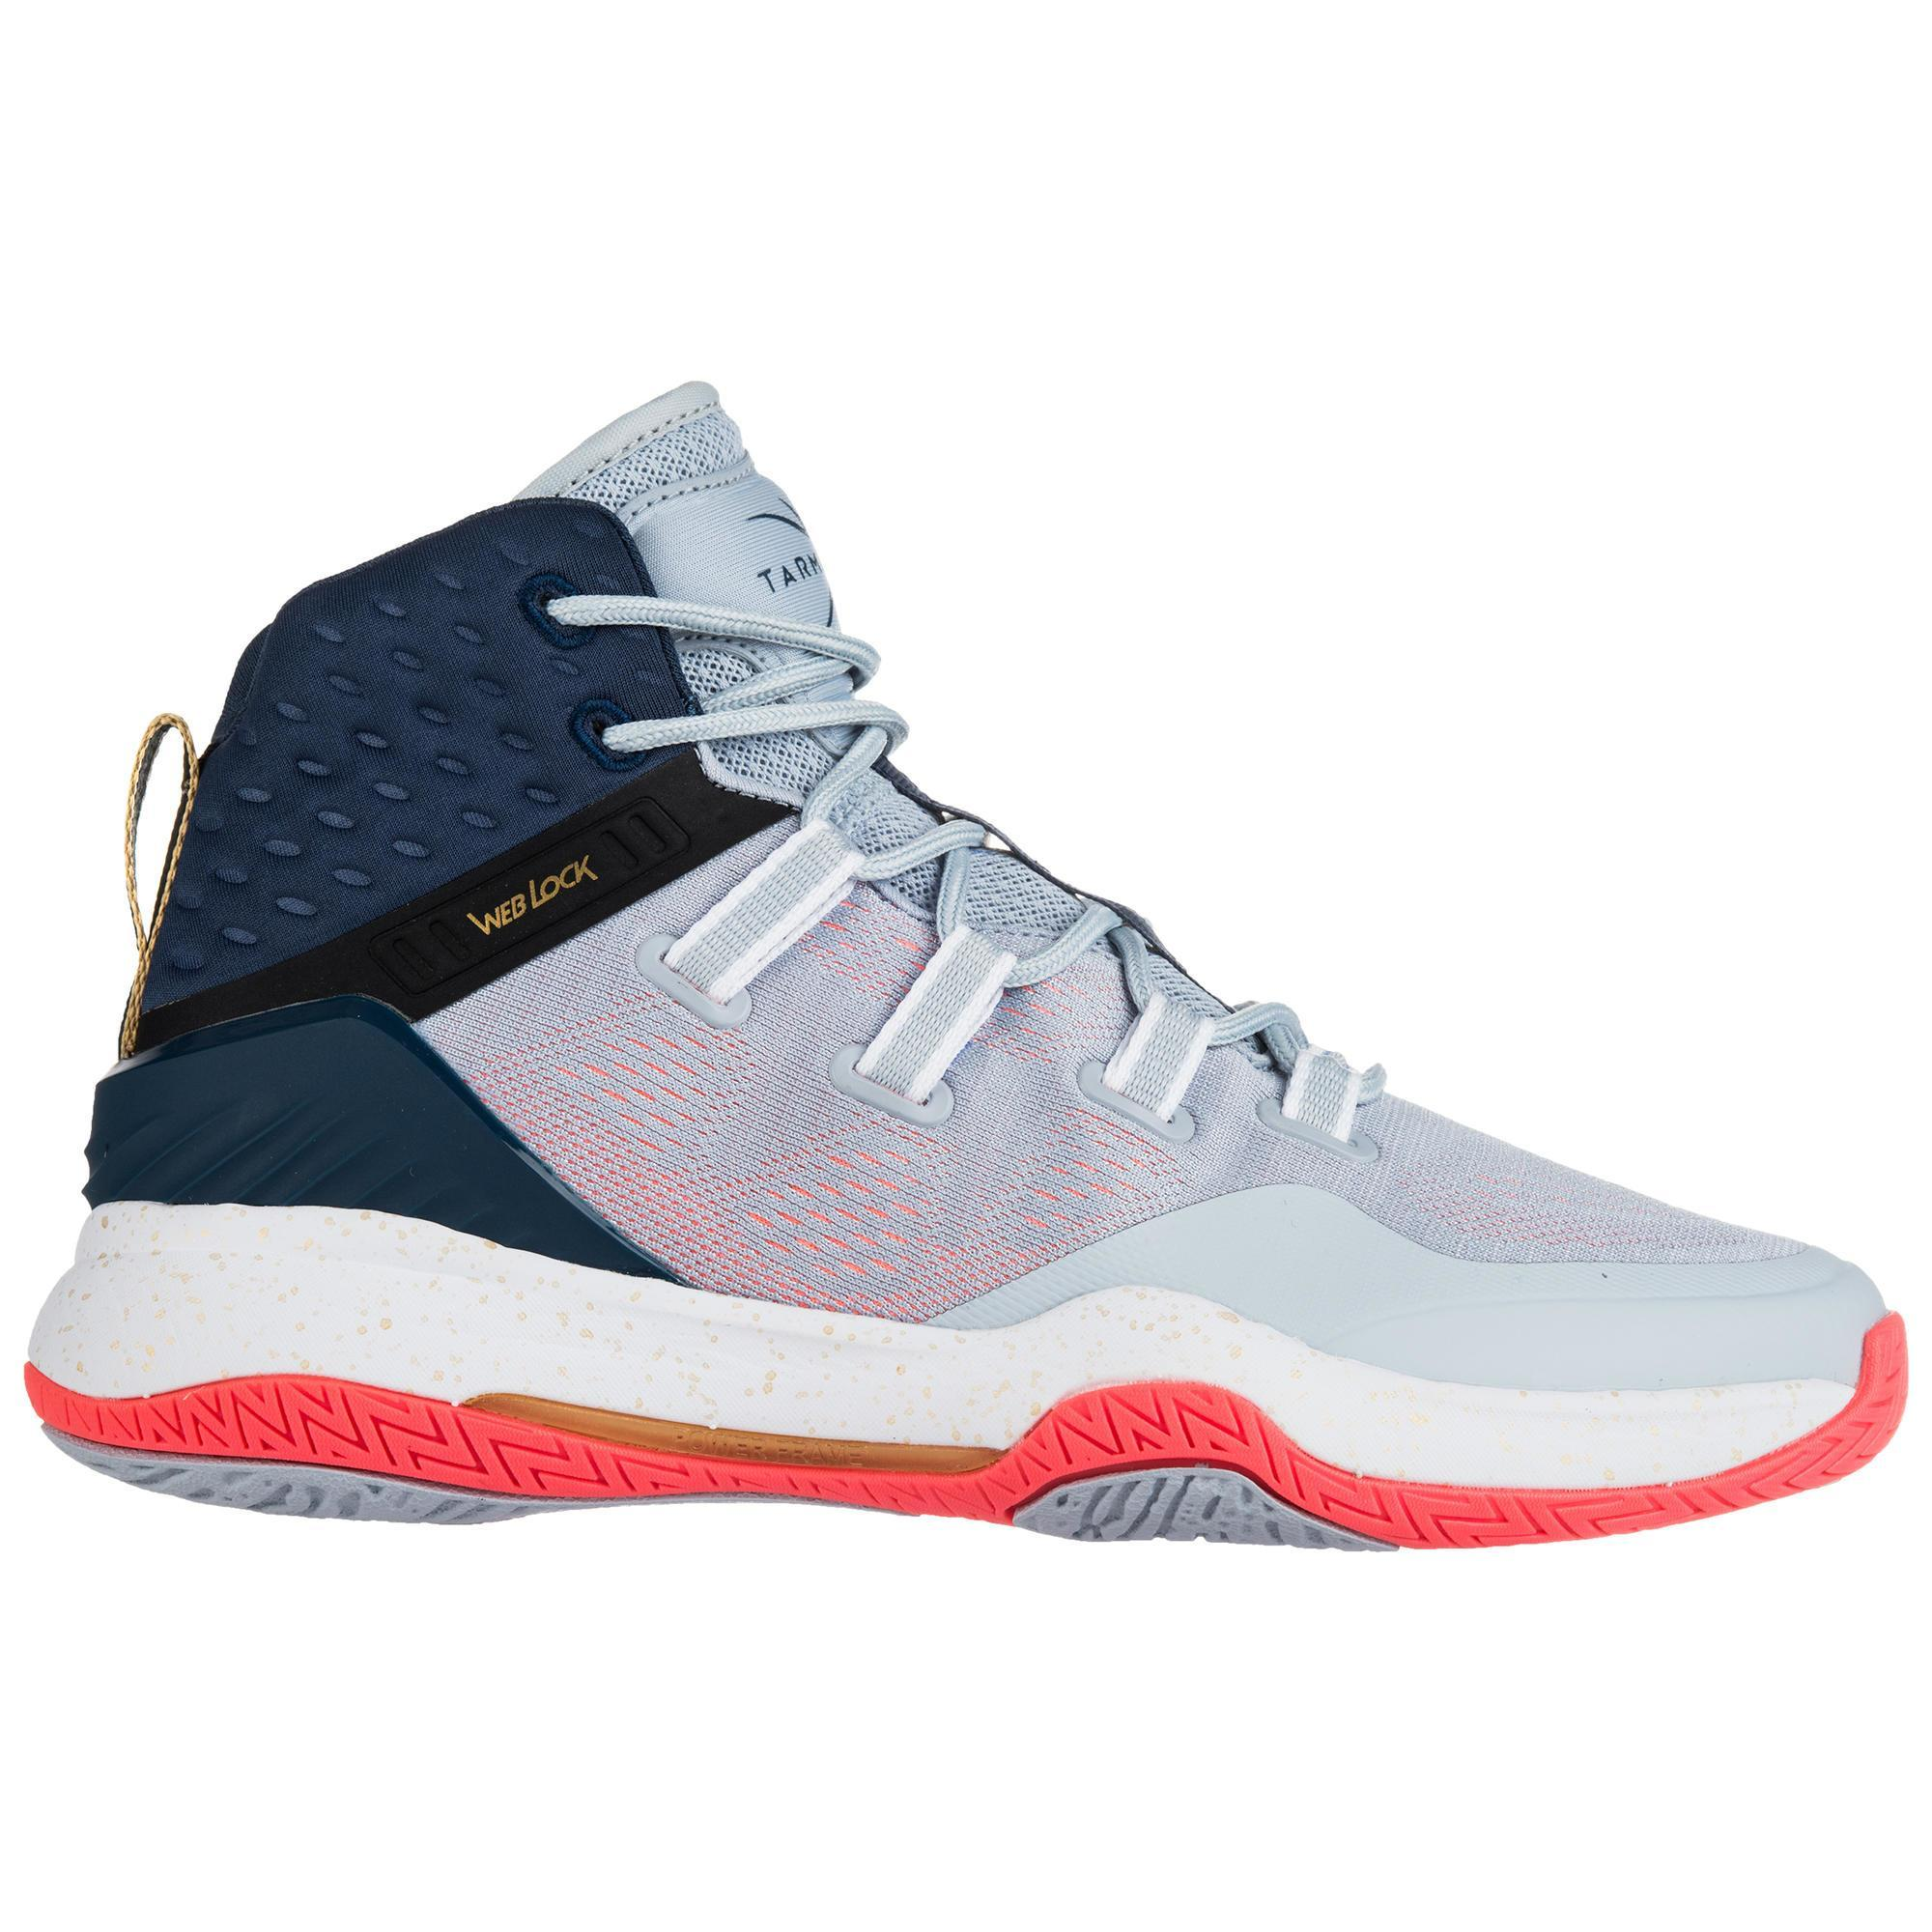 best website 100% high quality best prices Chaussures de basketball femme, chaussures de basket femme ...